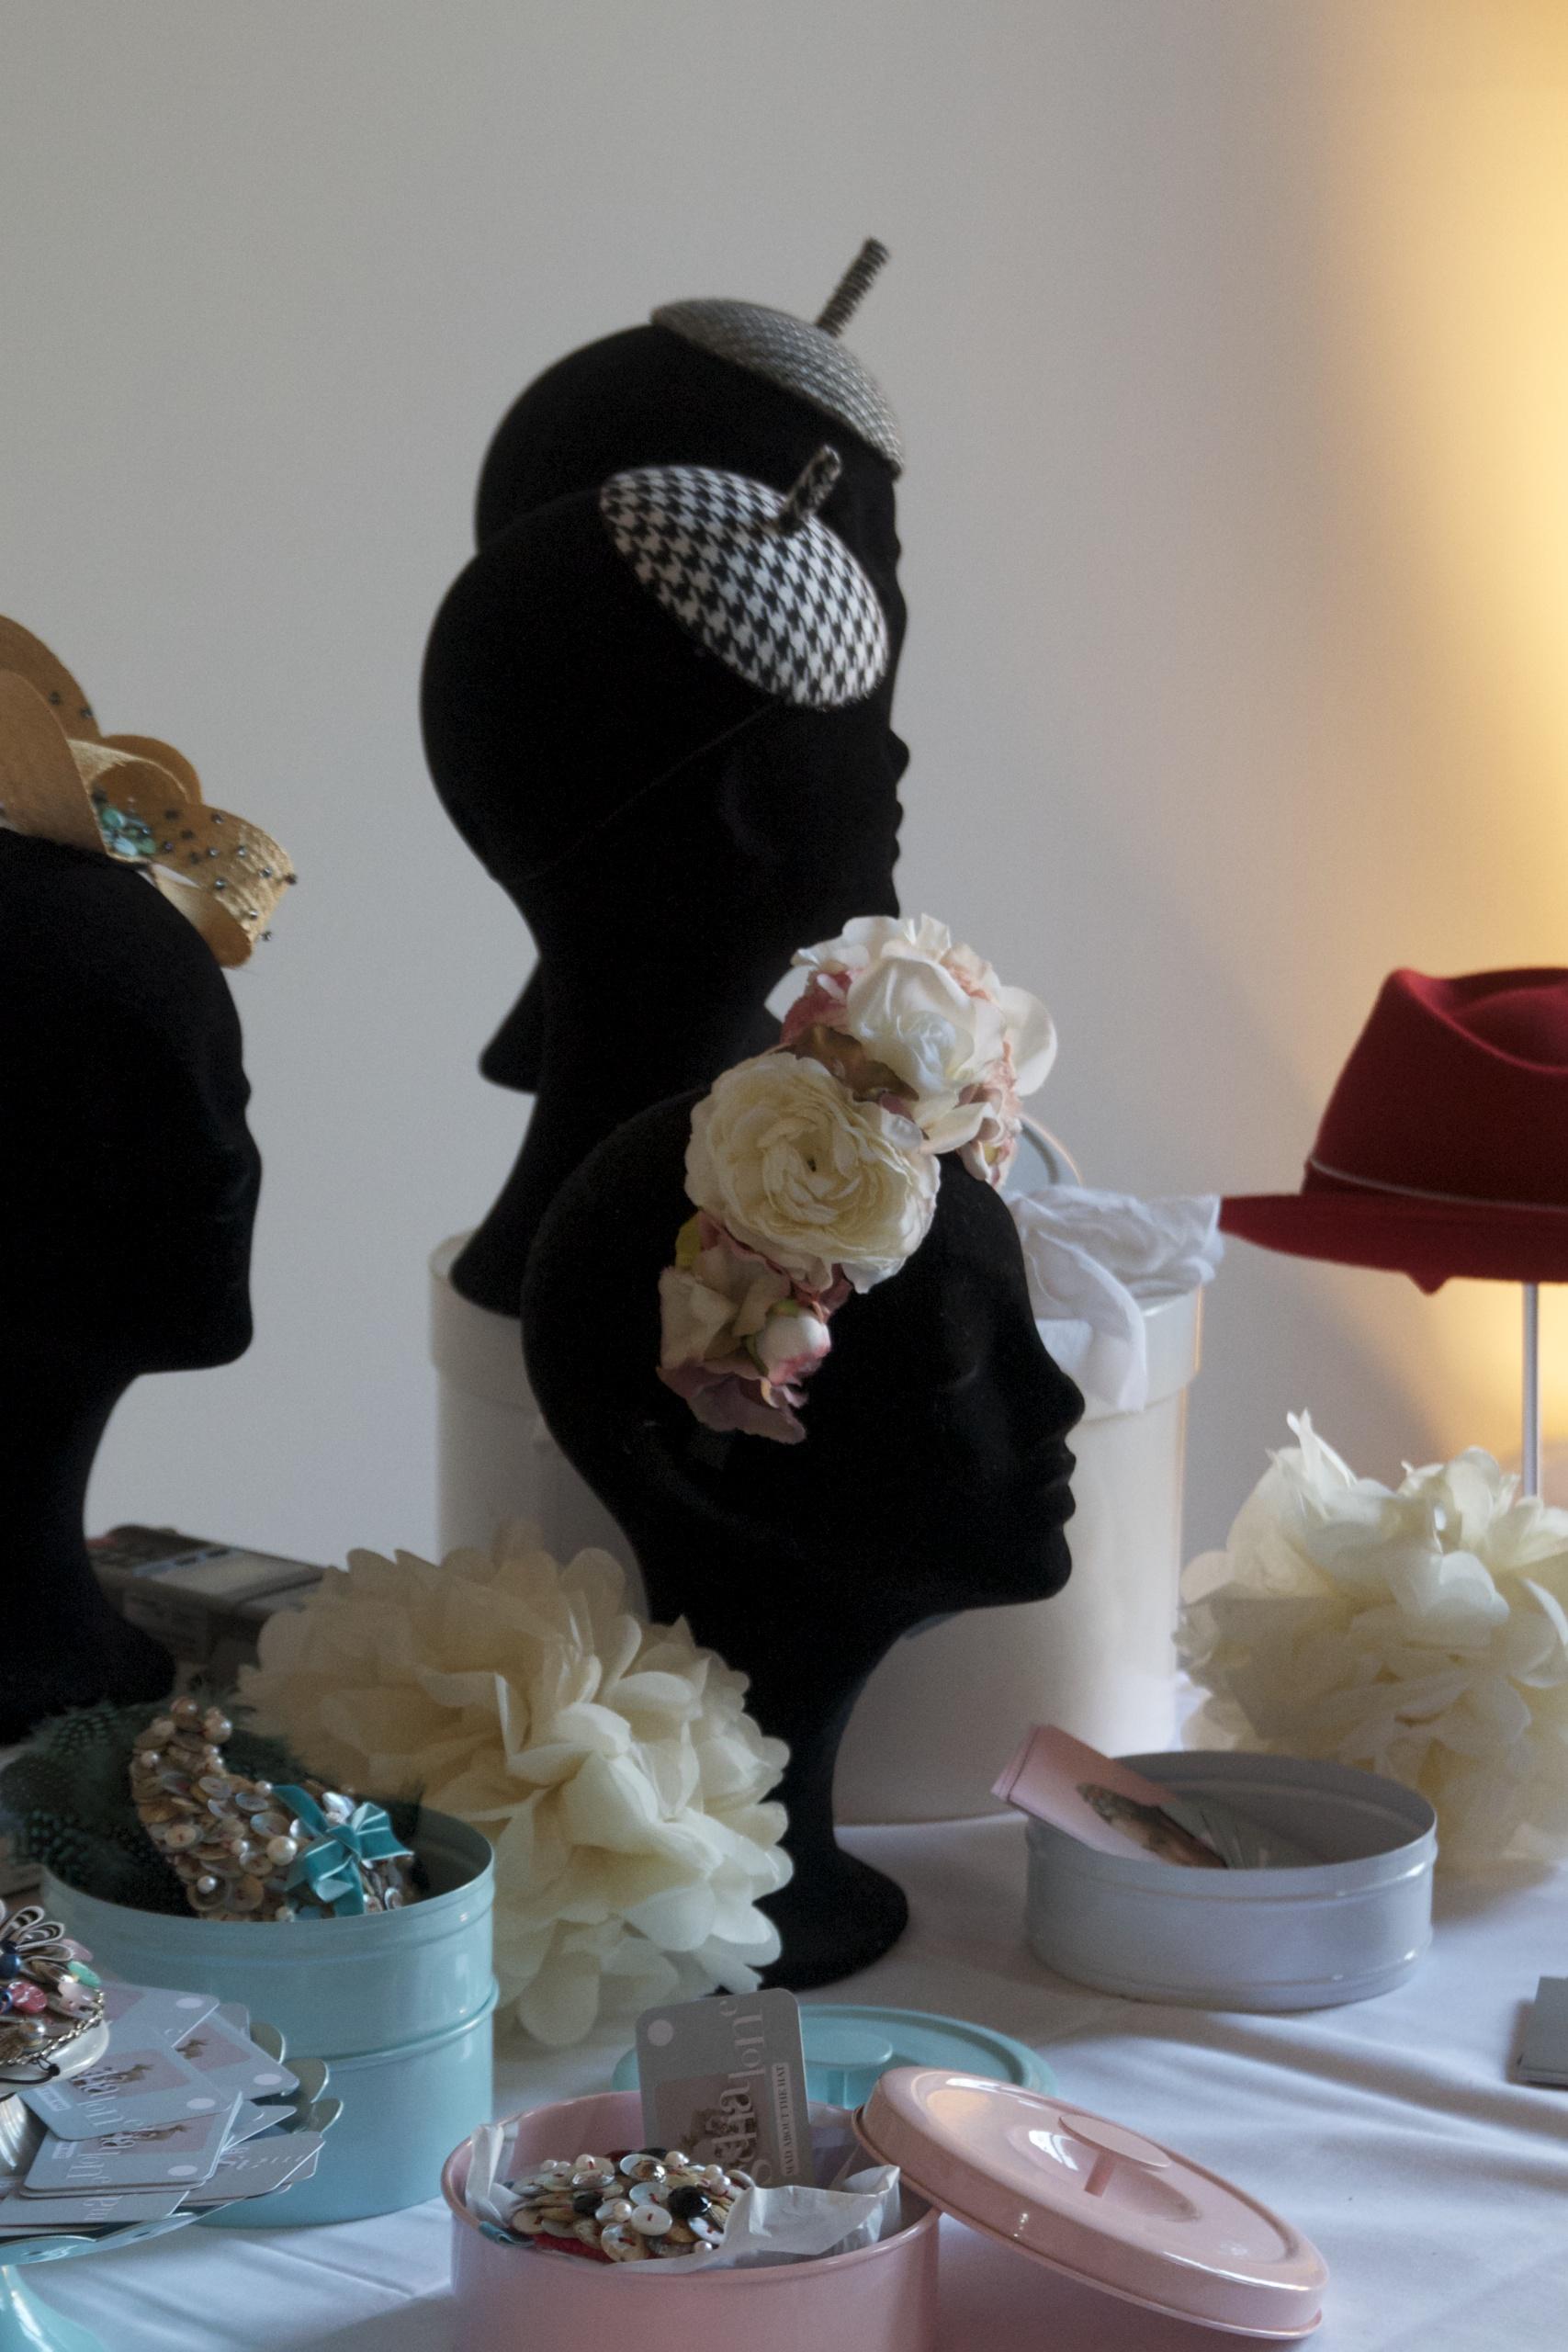 Blumenkranz, Haarschmuck, Hüte, Kopfbedeckung